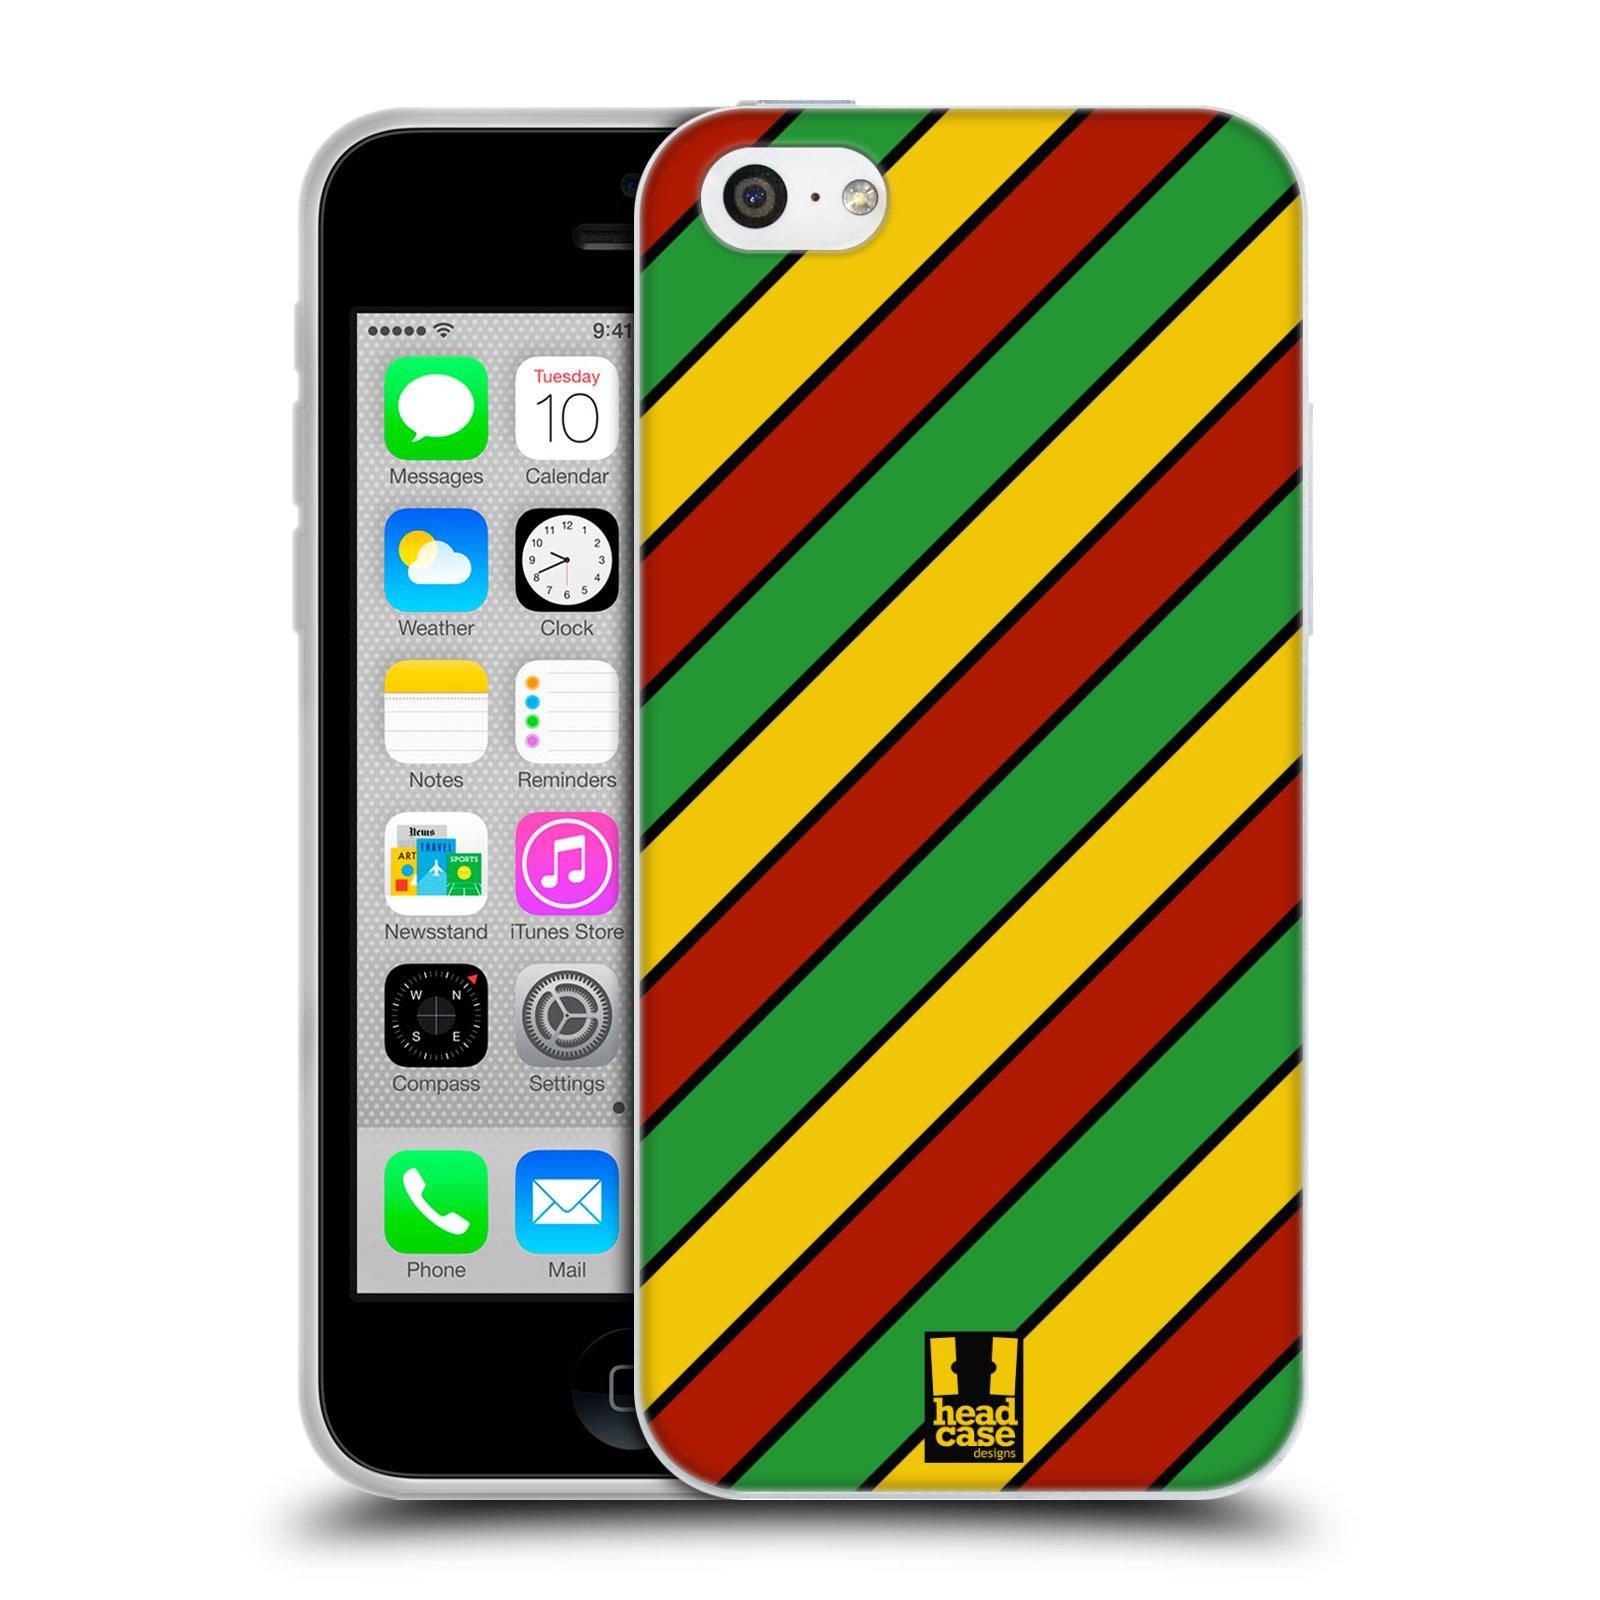 HEAD CASE silikonový obal na mobil Apple Iphone 5C vzor Rasta barevné vzory PRUHY